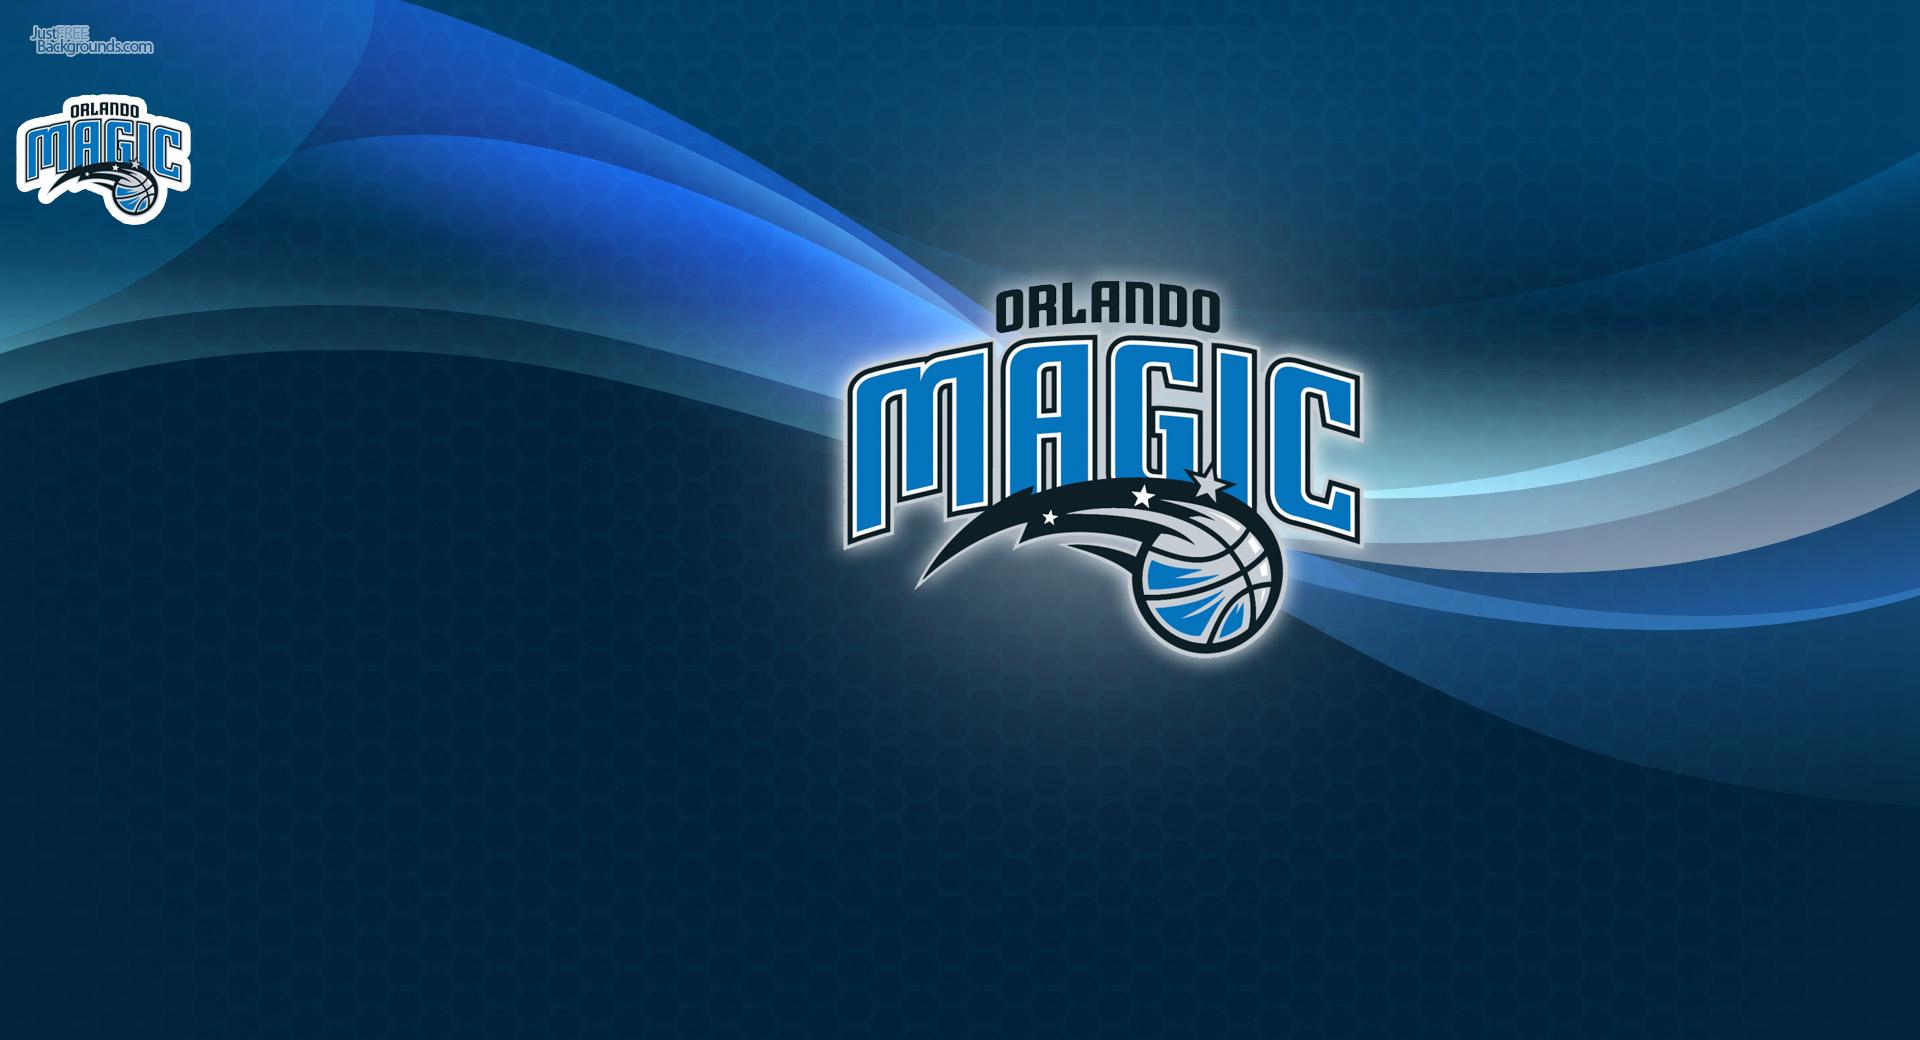 ORLANDO MAGIC nba basketball g wallpaper background